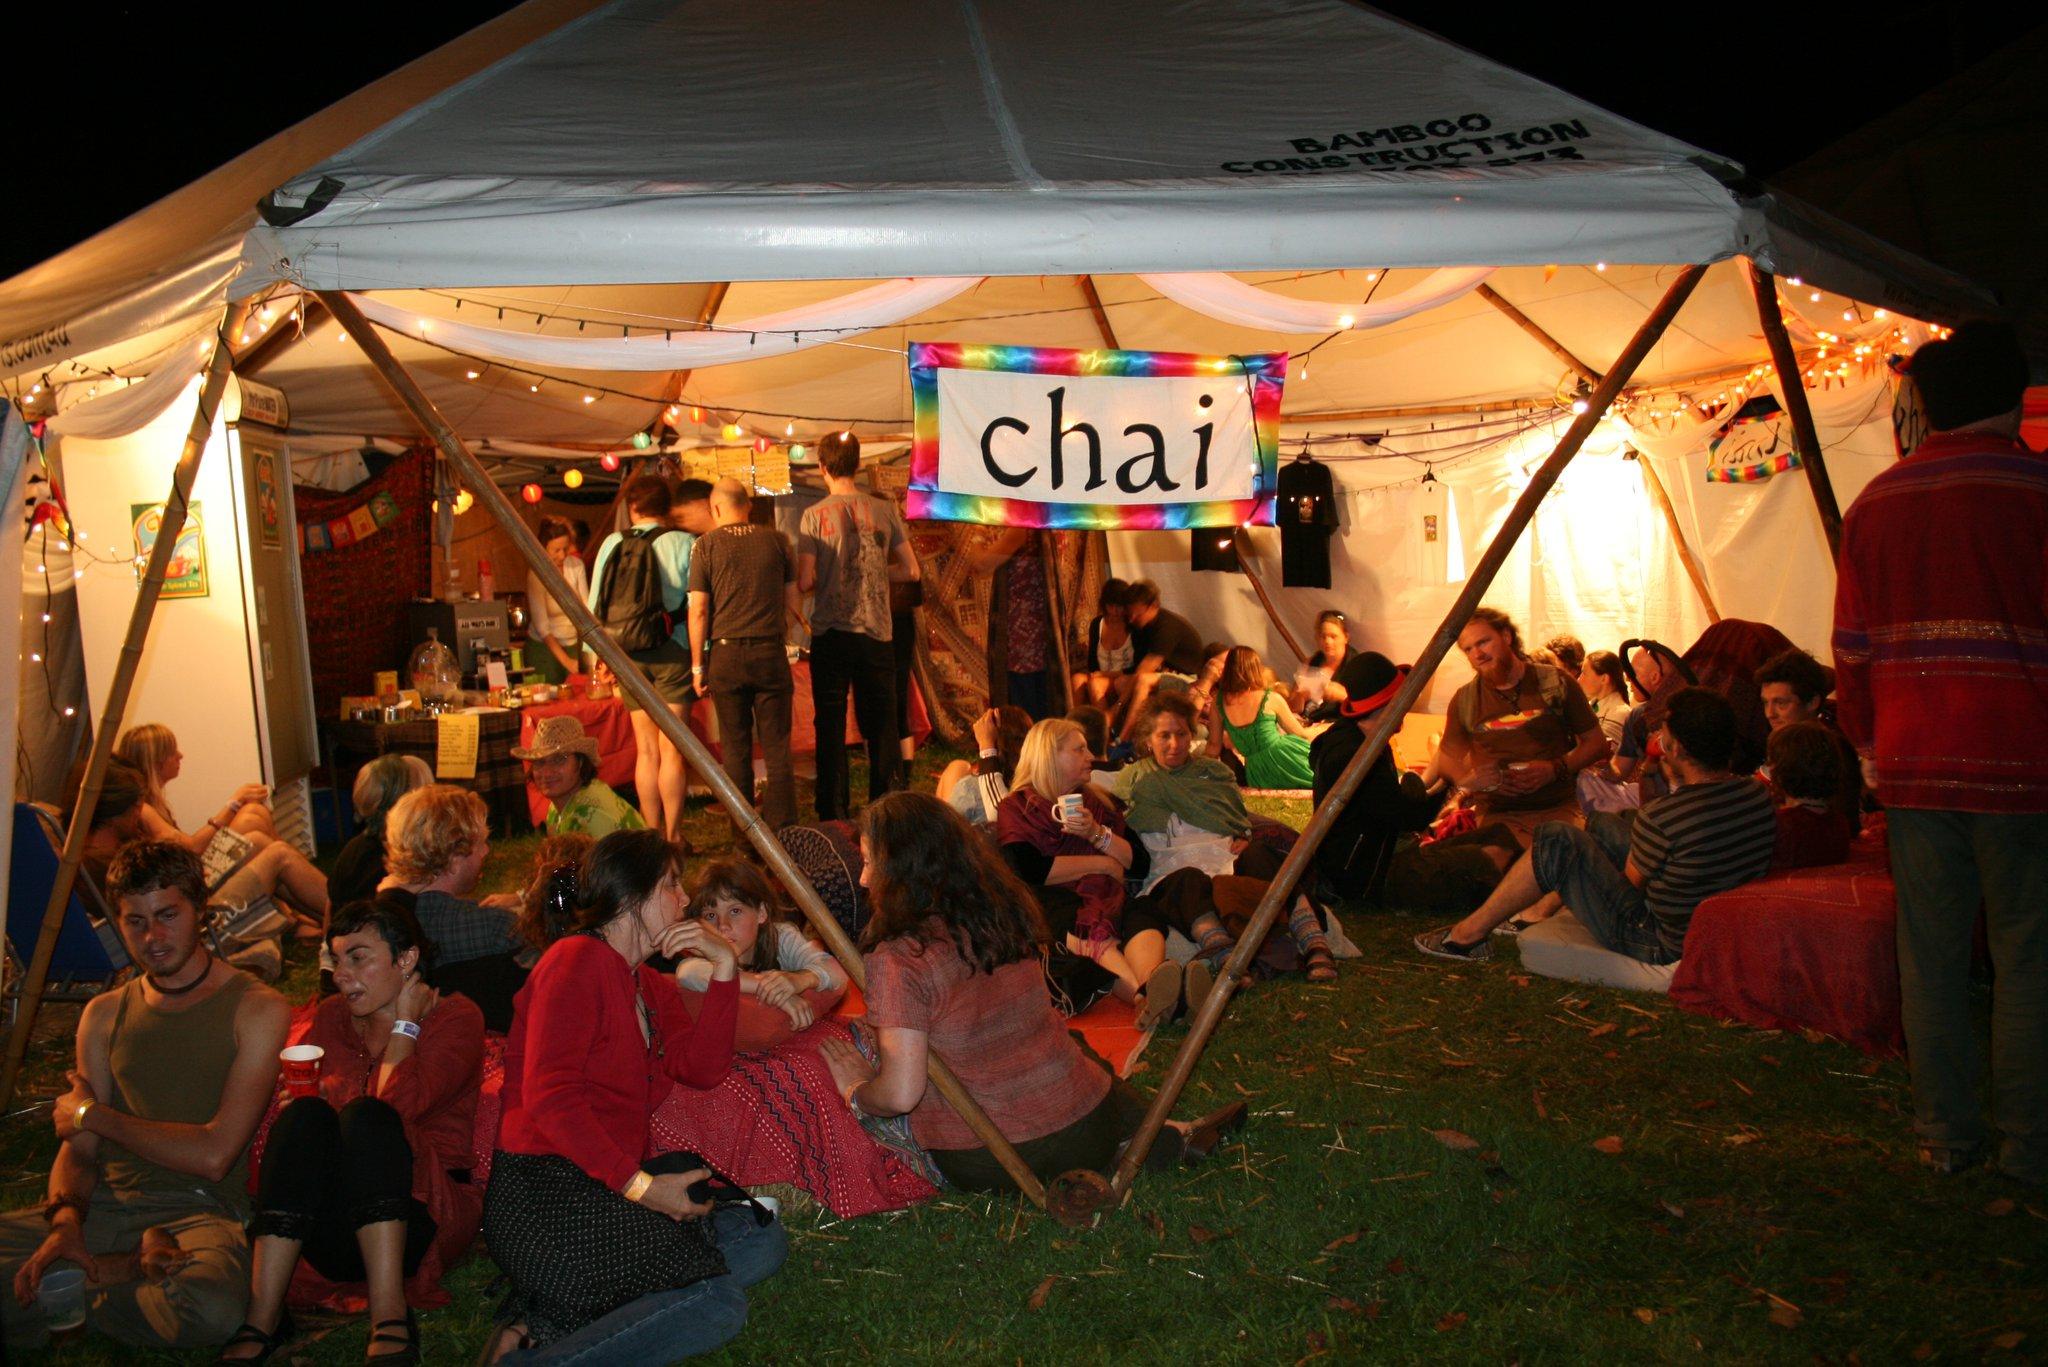 Chai Tent Global Carnival